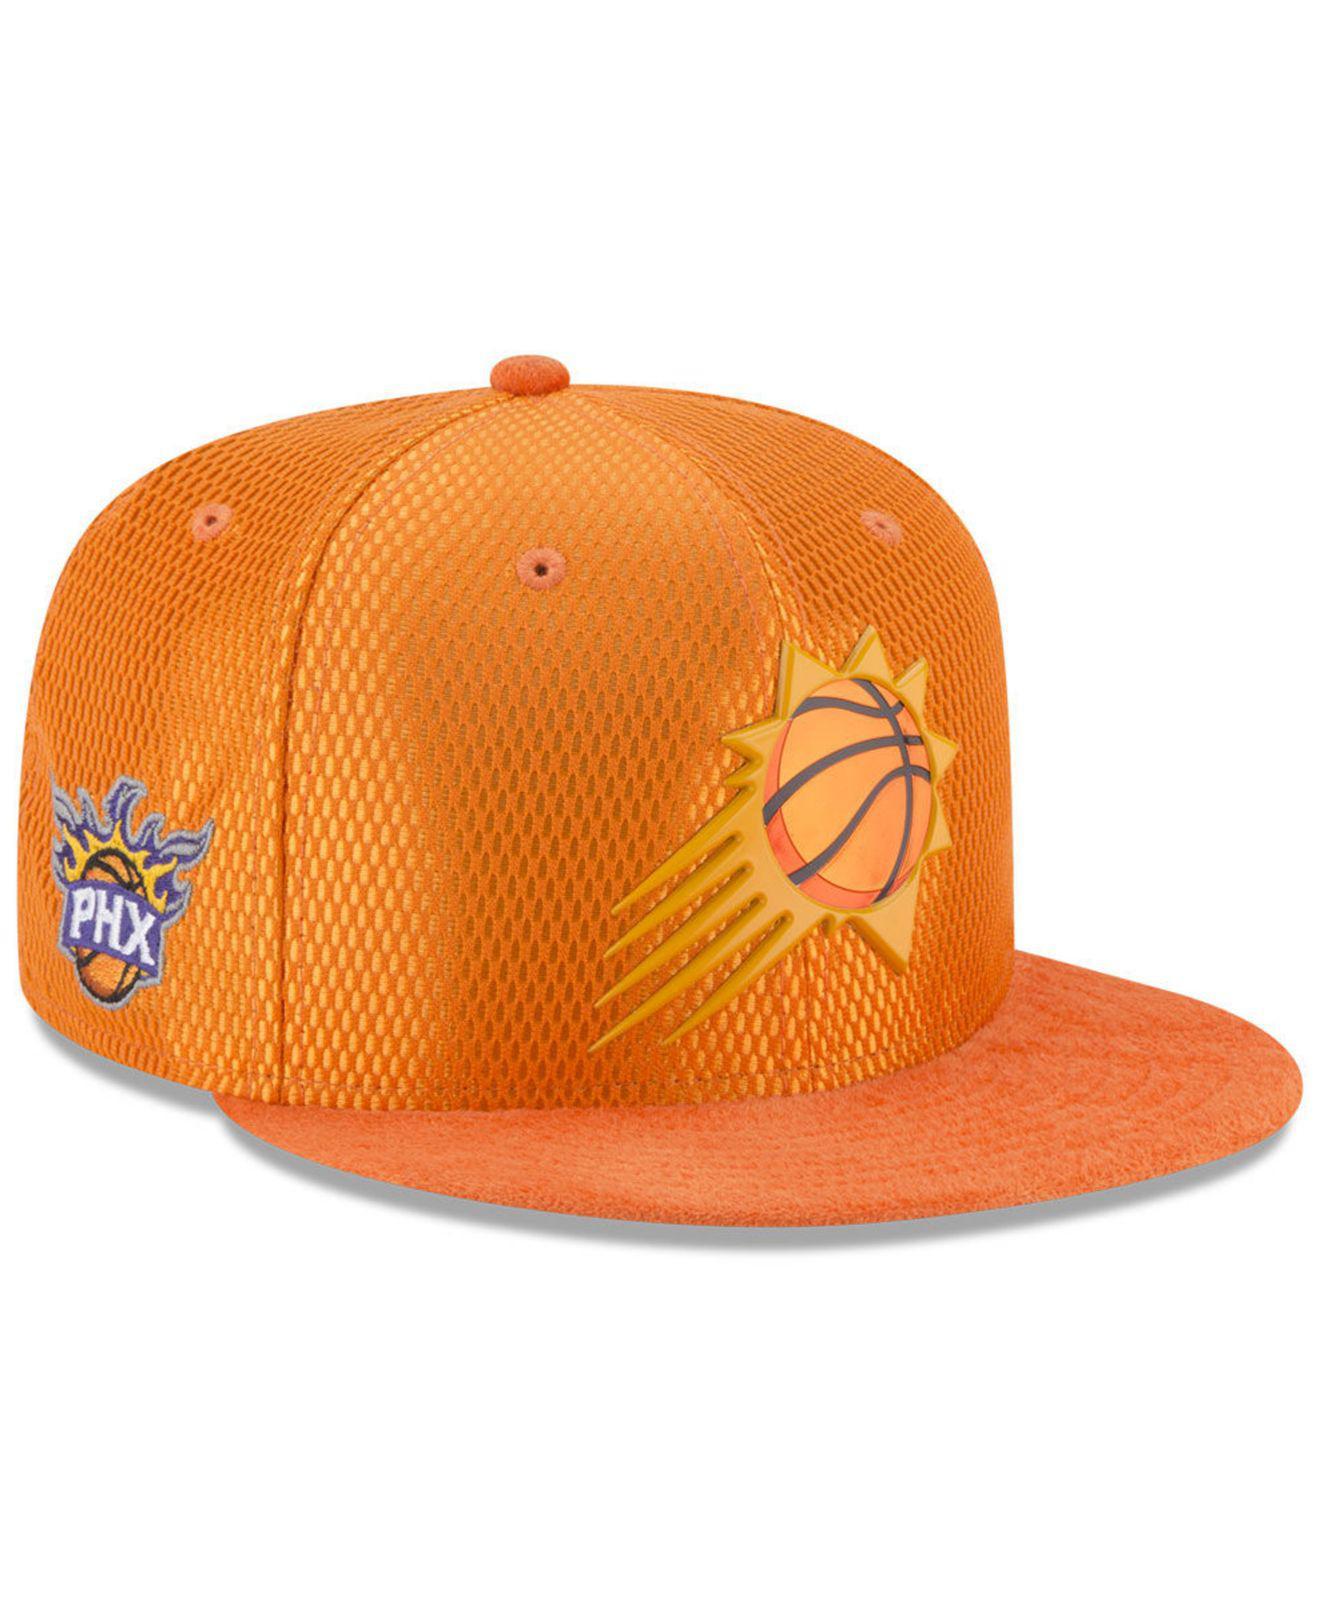 de5d4b2d3b1 Lyst - Ktz On Court Reverse 9fifty Snapback Cap in Orange for Men